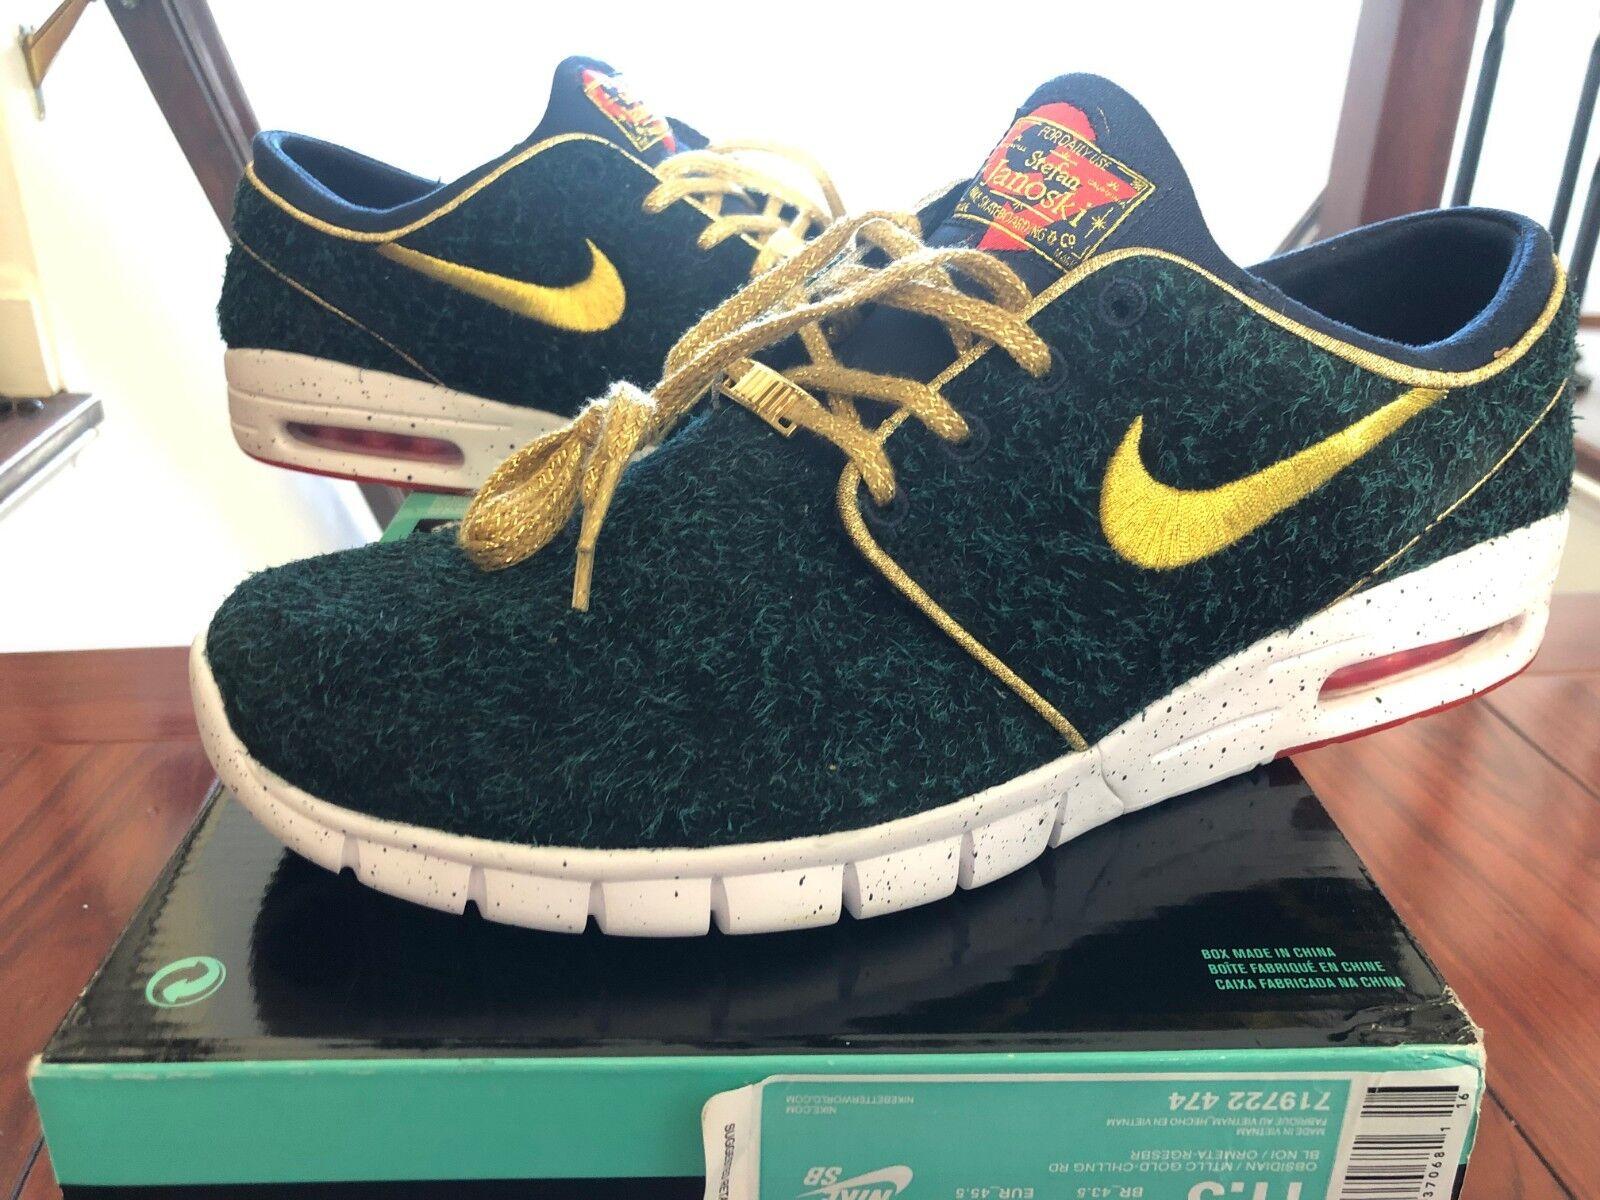 Nike Stefan Janoski Max Dernbecher size 11.5 New with ripped top box. 719722-474